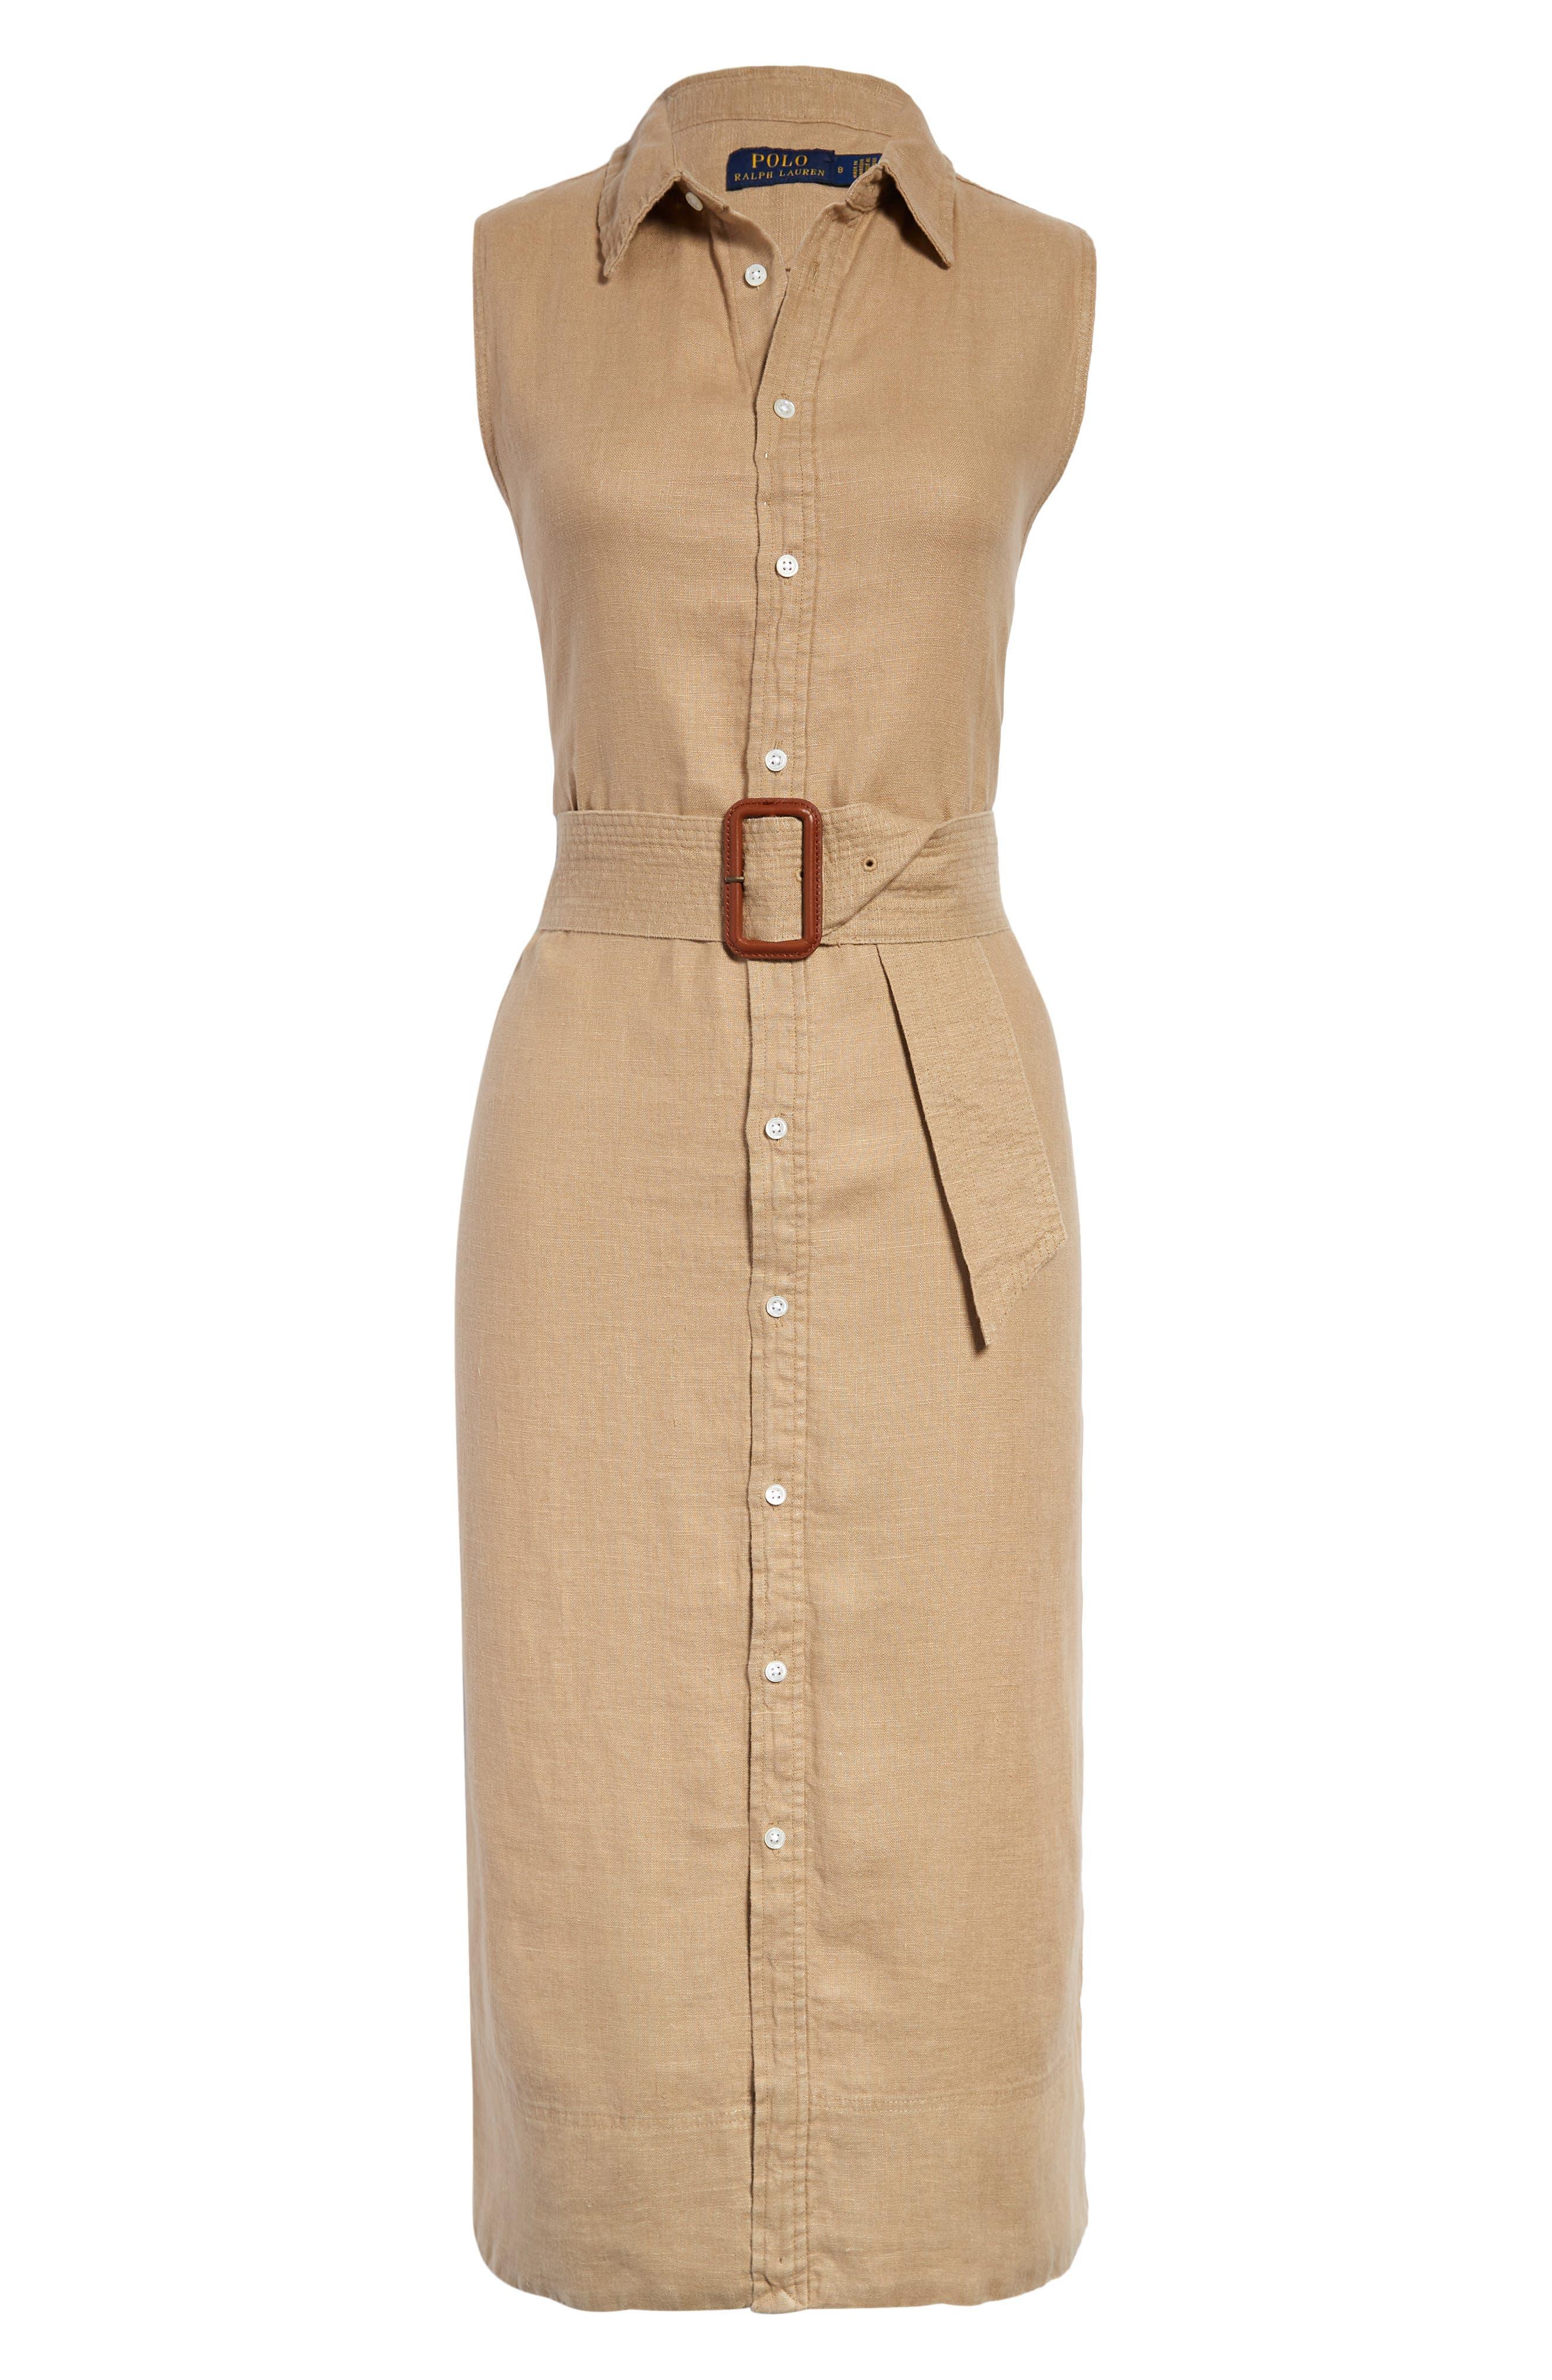 Women's Polo Ralph Lauren Dresses | Nordstrom